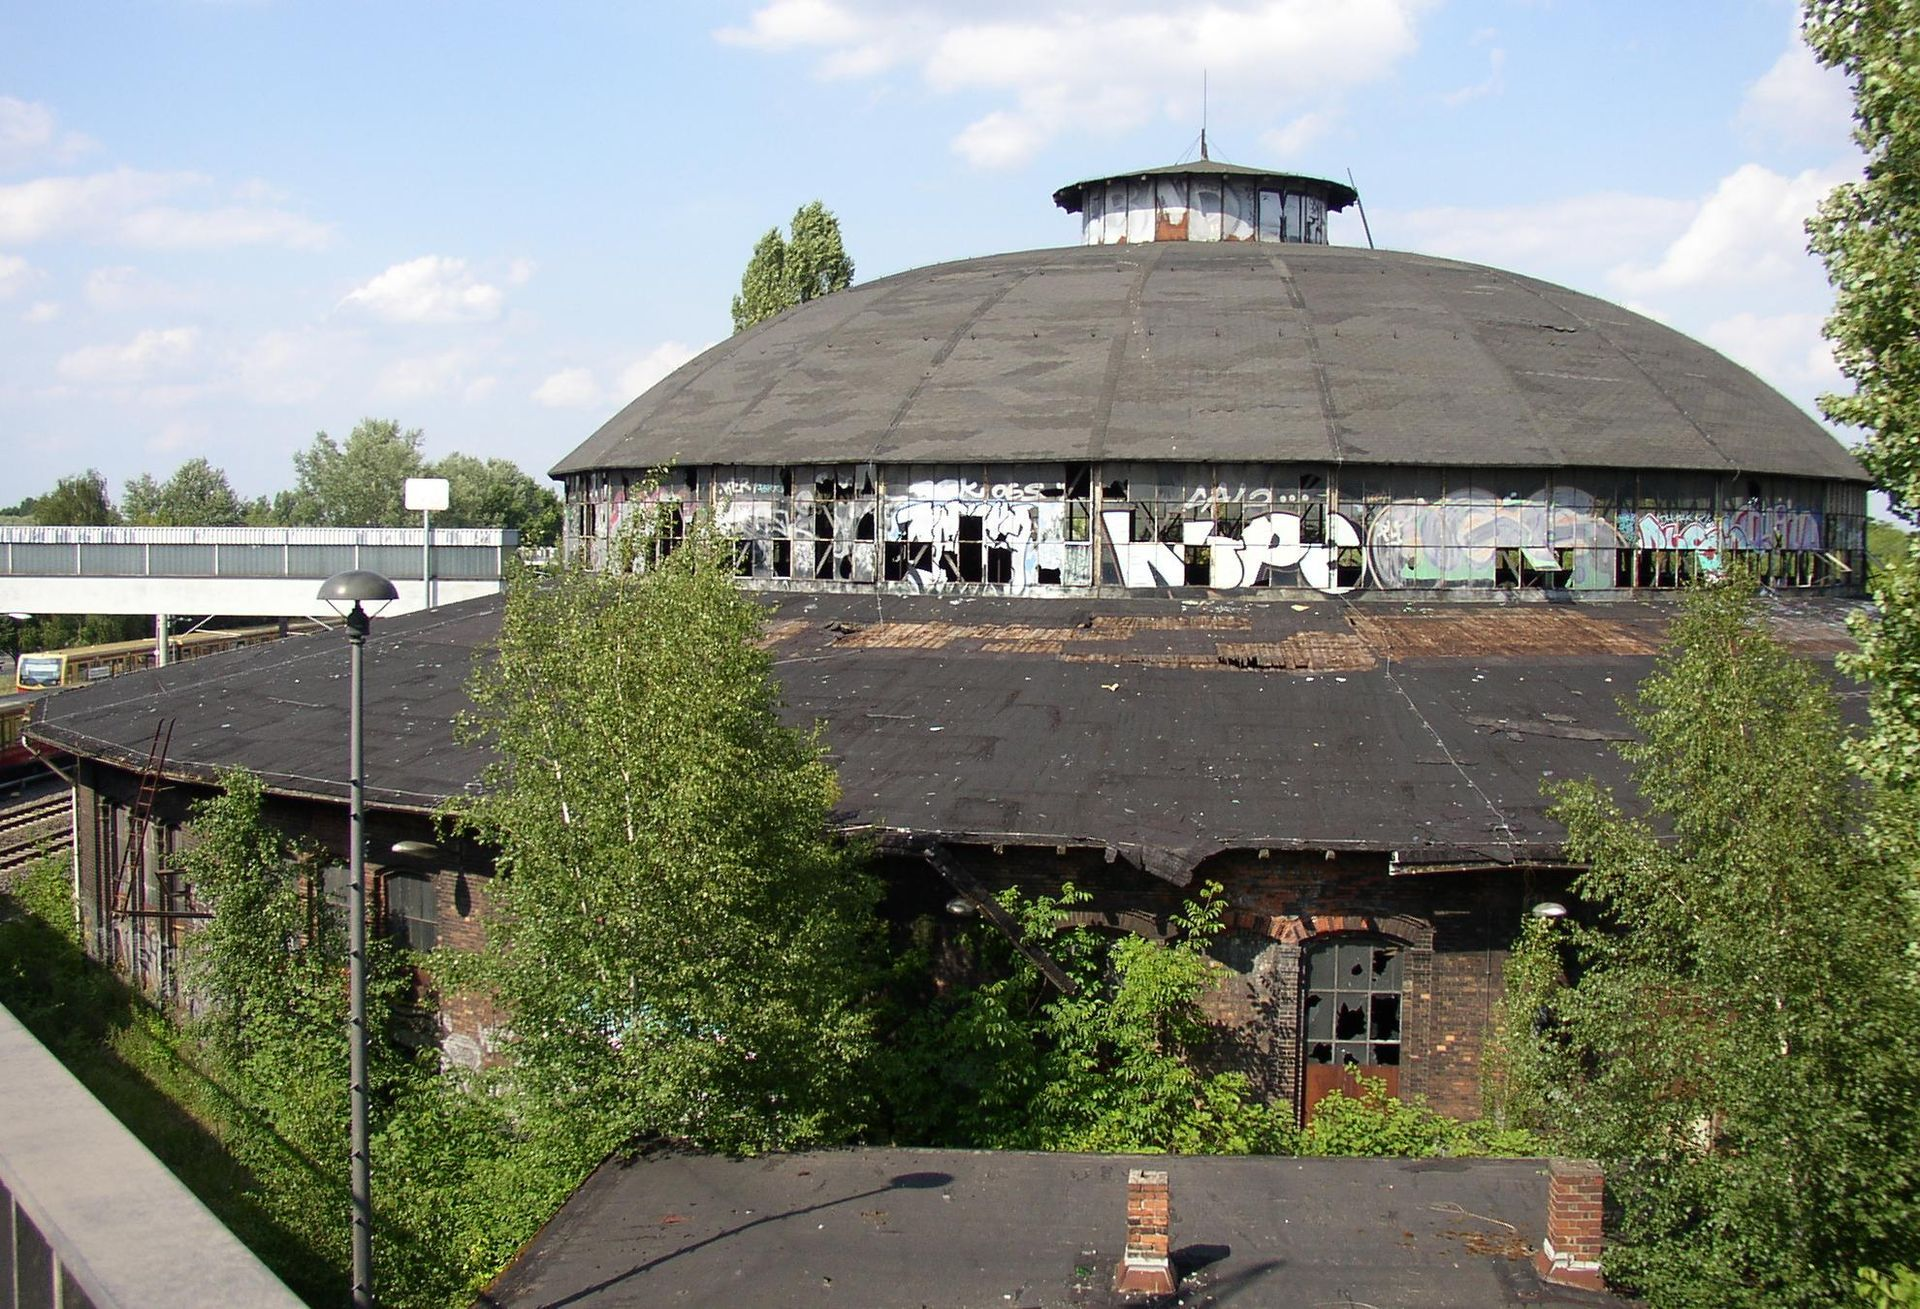 Berlin-Pankow, Rundlokschuppen, Bild: Doris Antony, CC-BY-SA 3.0